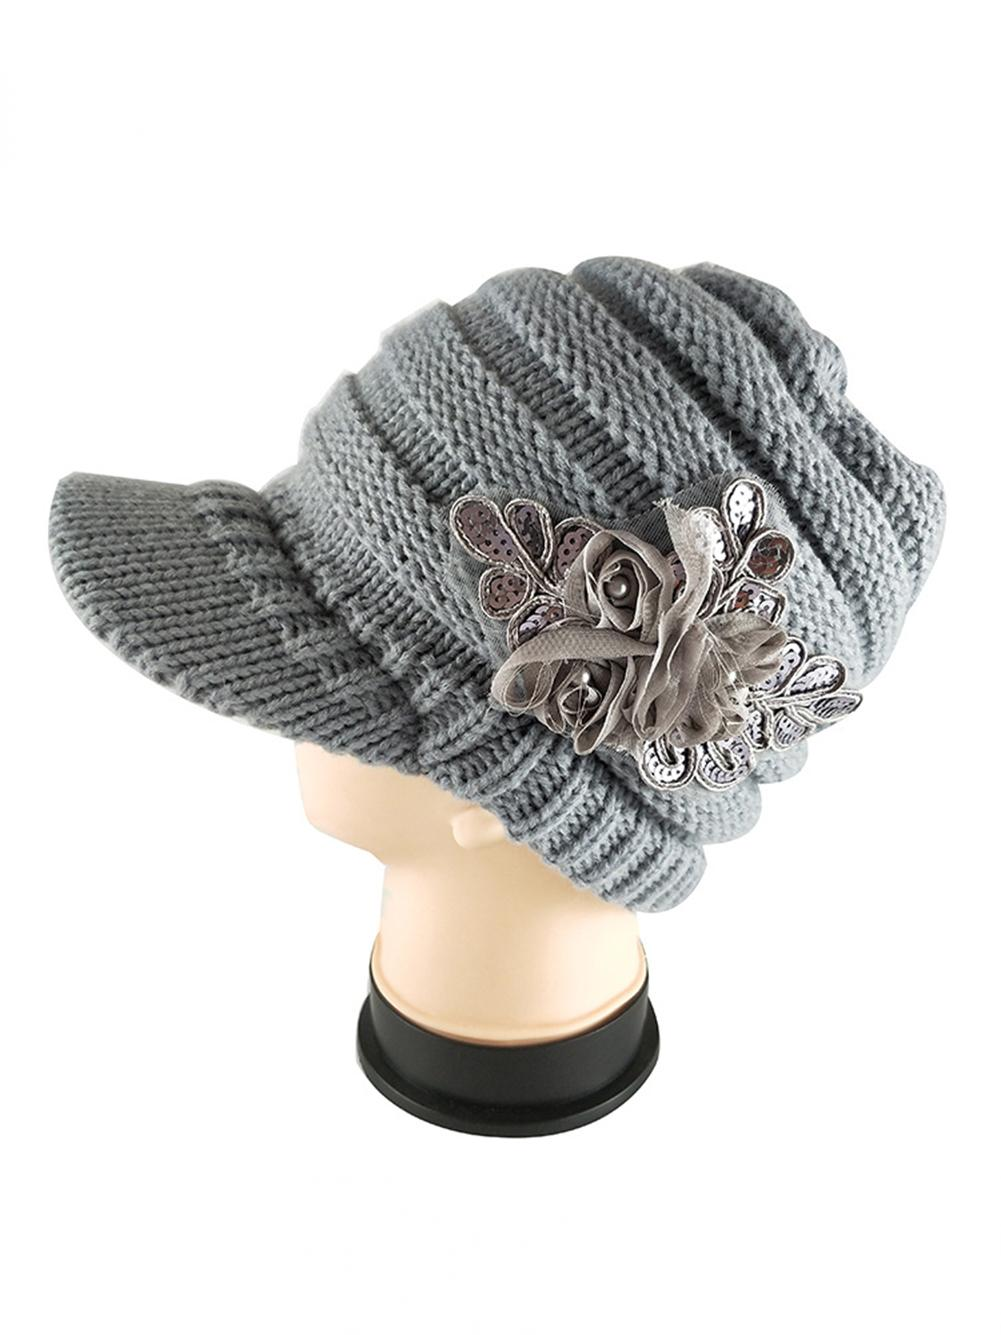 Fashion Winter Women Woolen Yarn Plain Weave Knitting Sequins Flower Visor  Hat 8961f4cfe9c